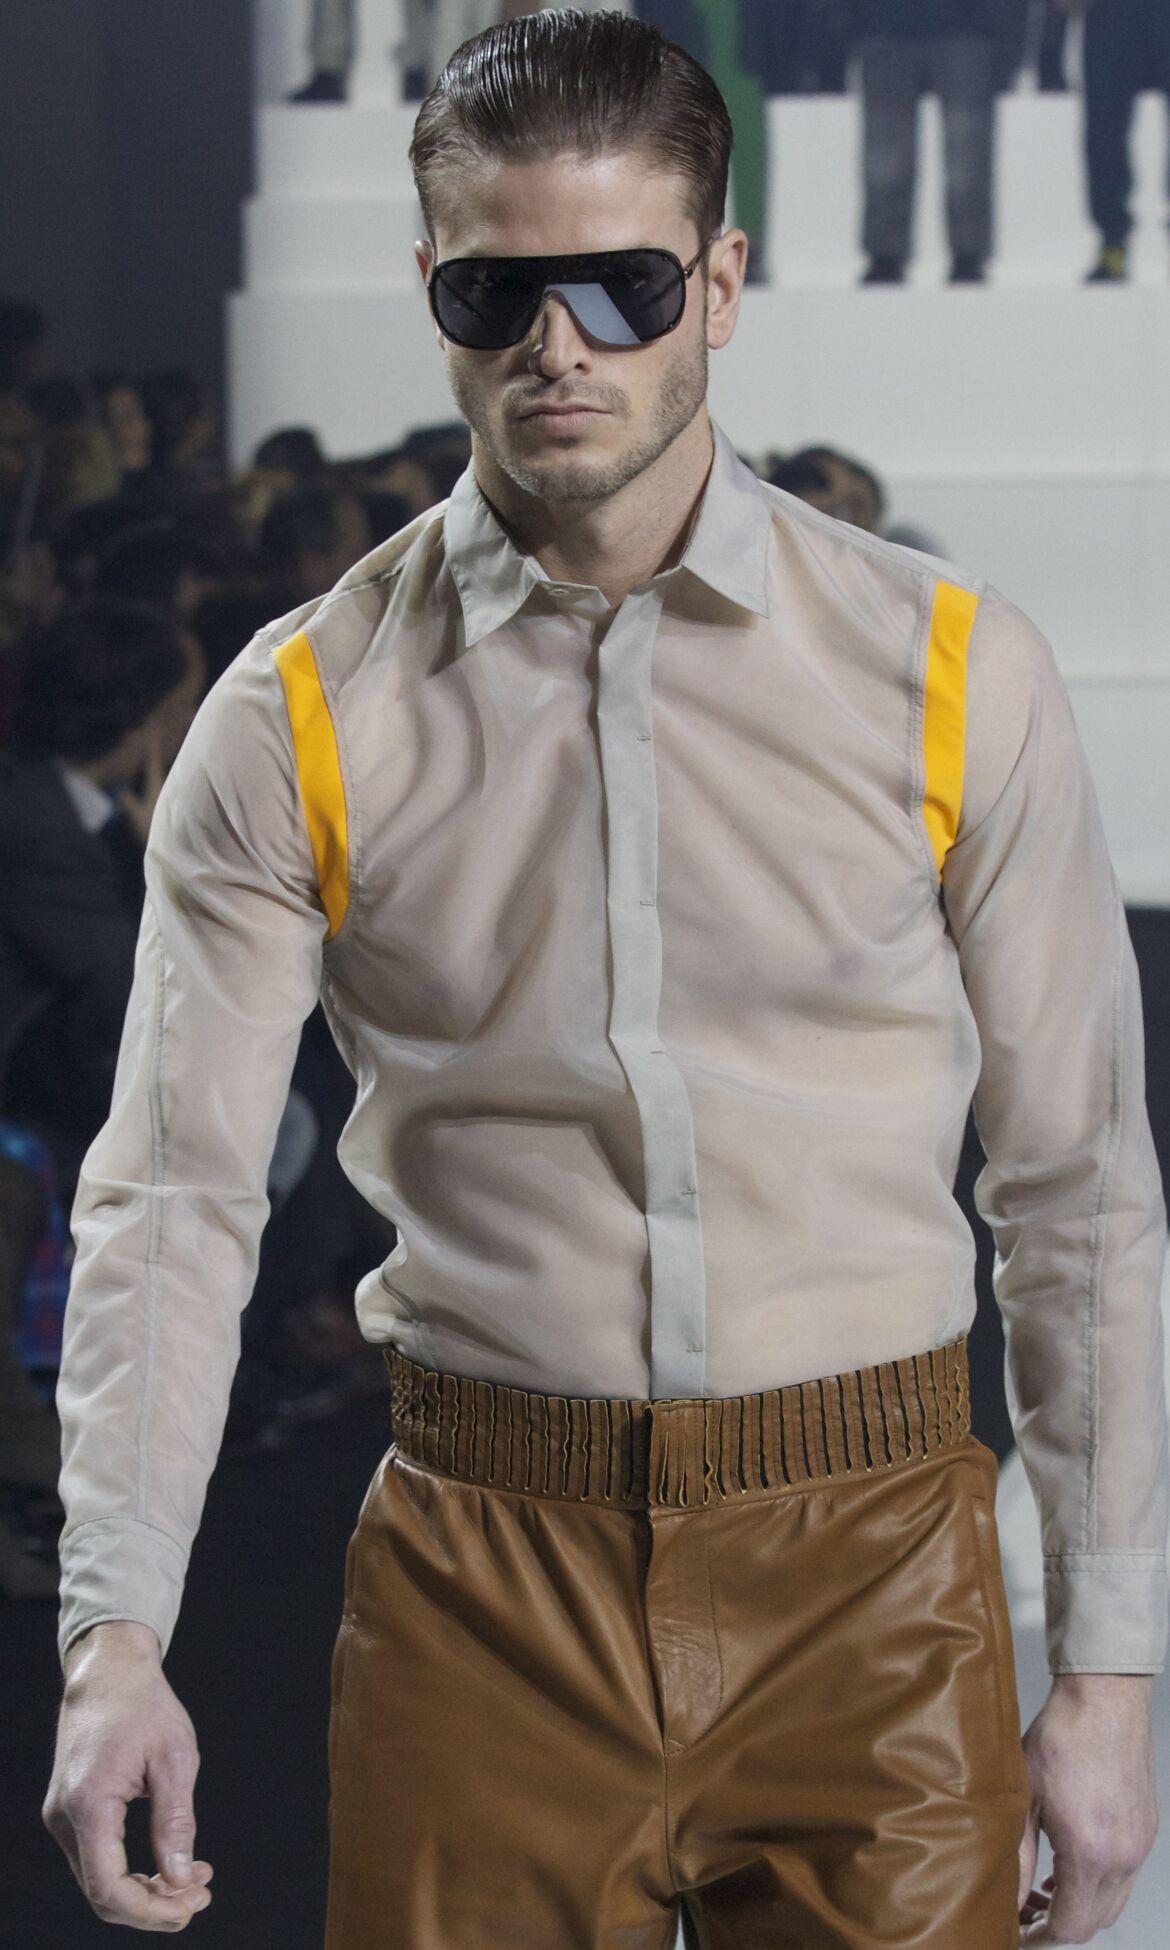 Dirk Bikkembergs Fashion Trends